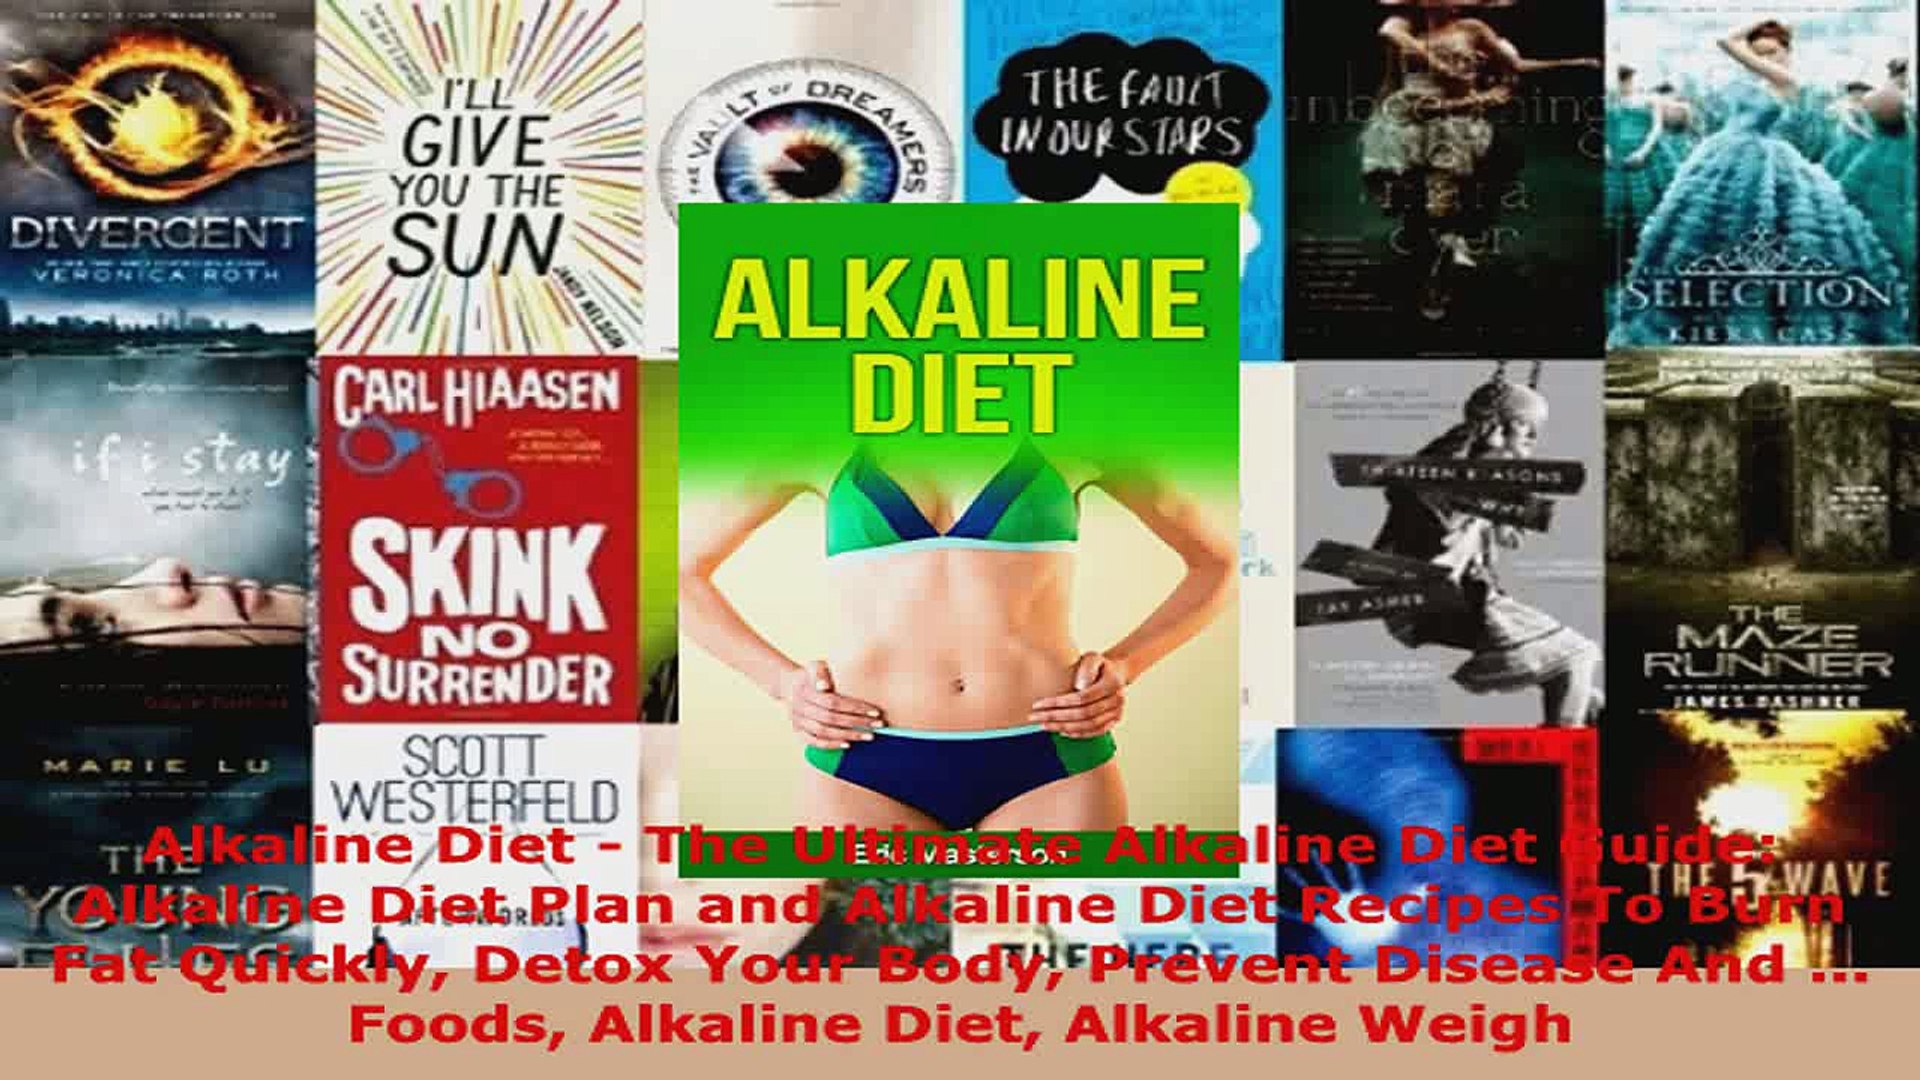 Read  Alkaline Diet  The Ultimate Alkaline Diet Guide Alkaline Diet Plan and Alkaline Diet PDF Free